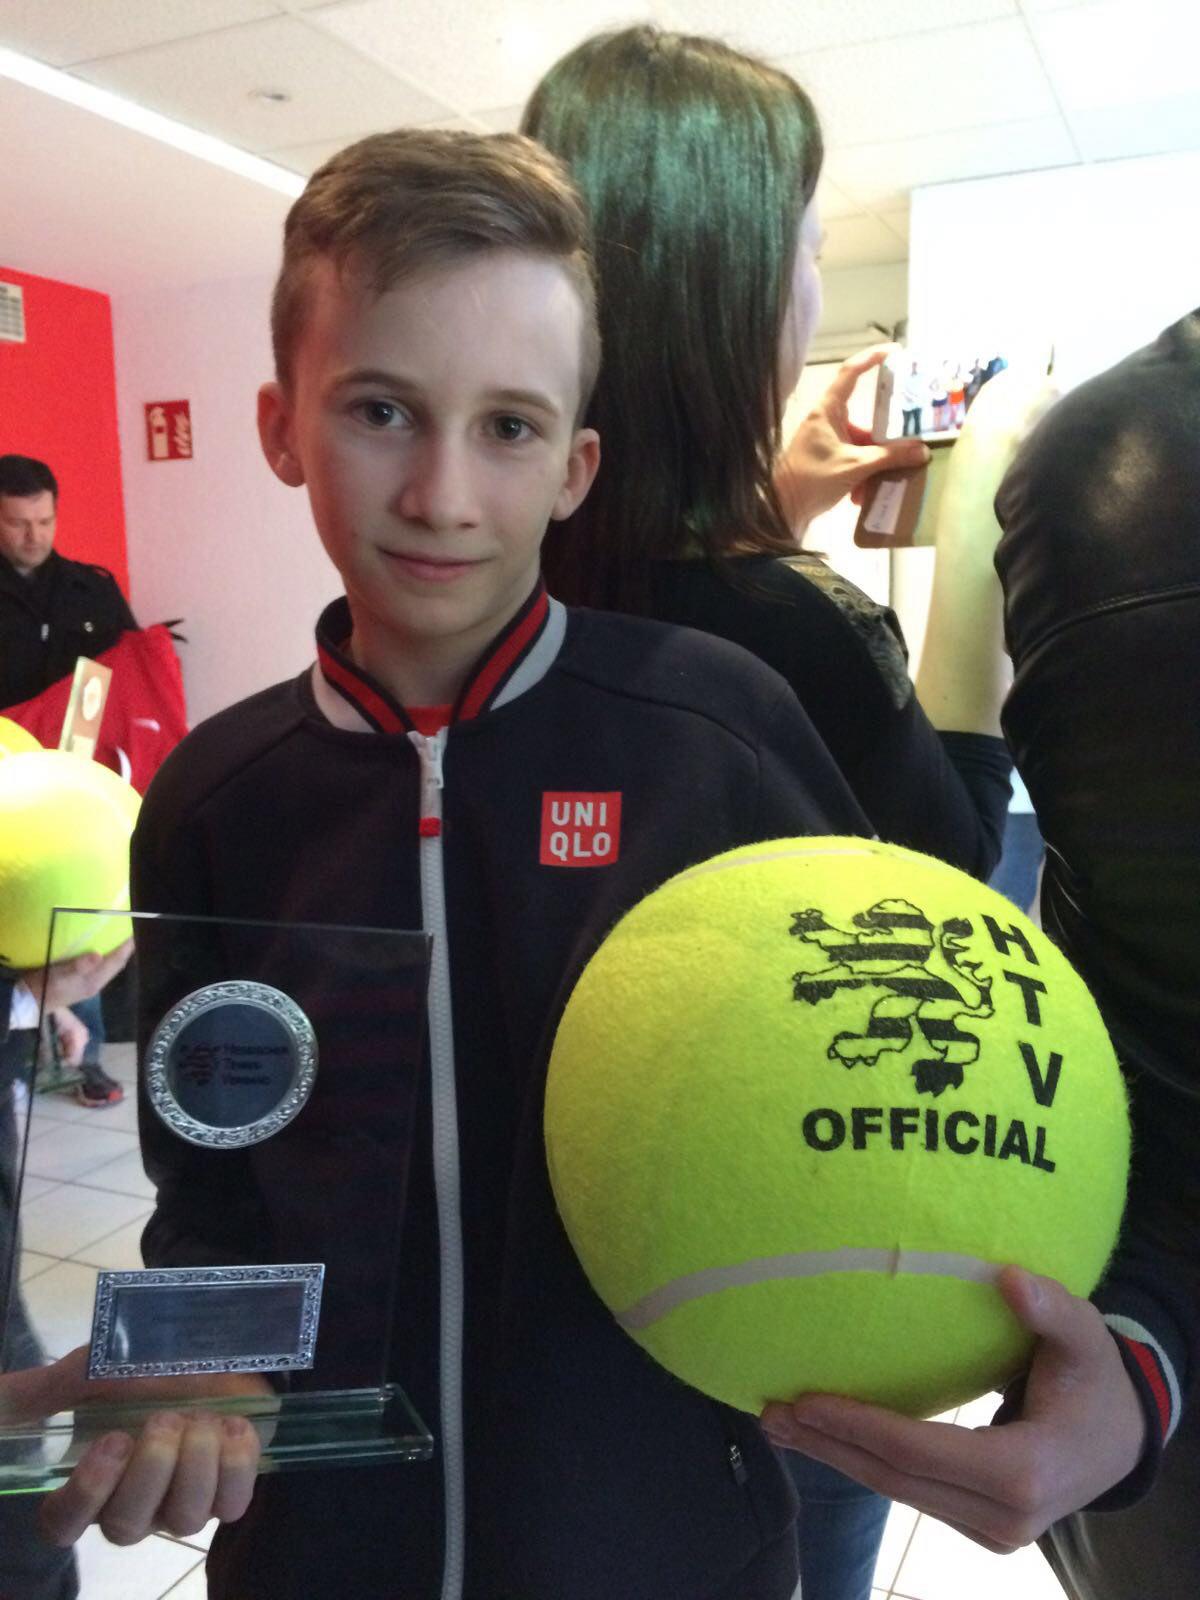 UTHC-Tennisnachwuchs Sergej Topic zum dritten Mal Hessenmeister